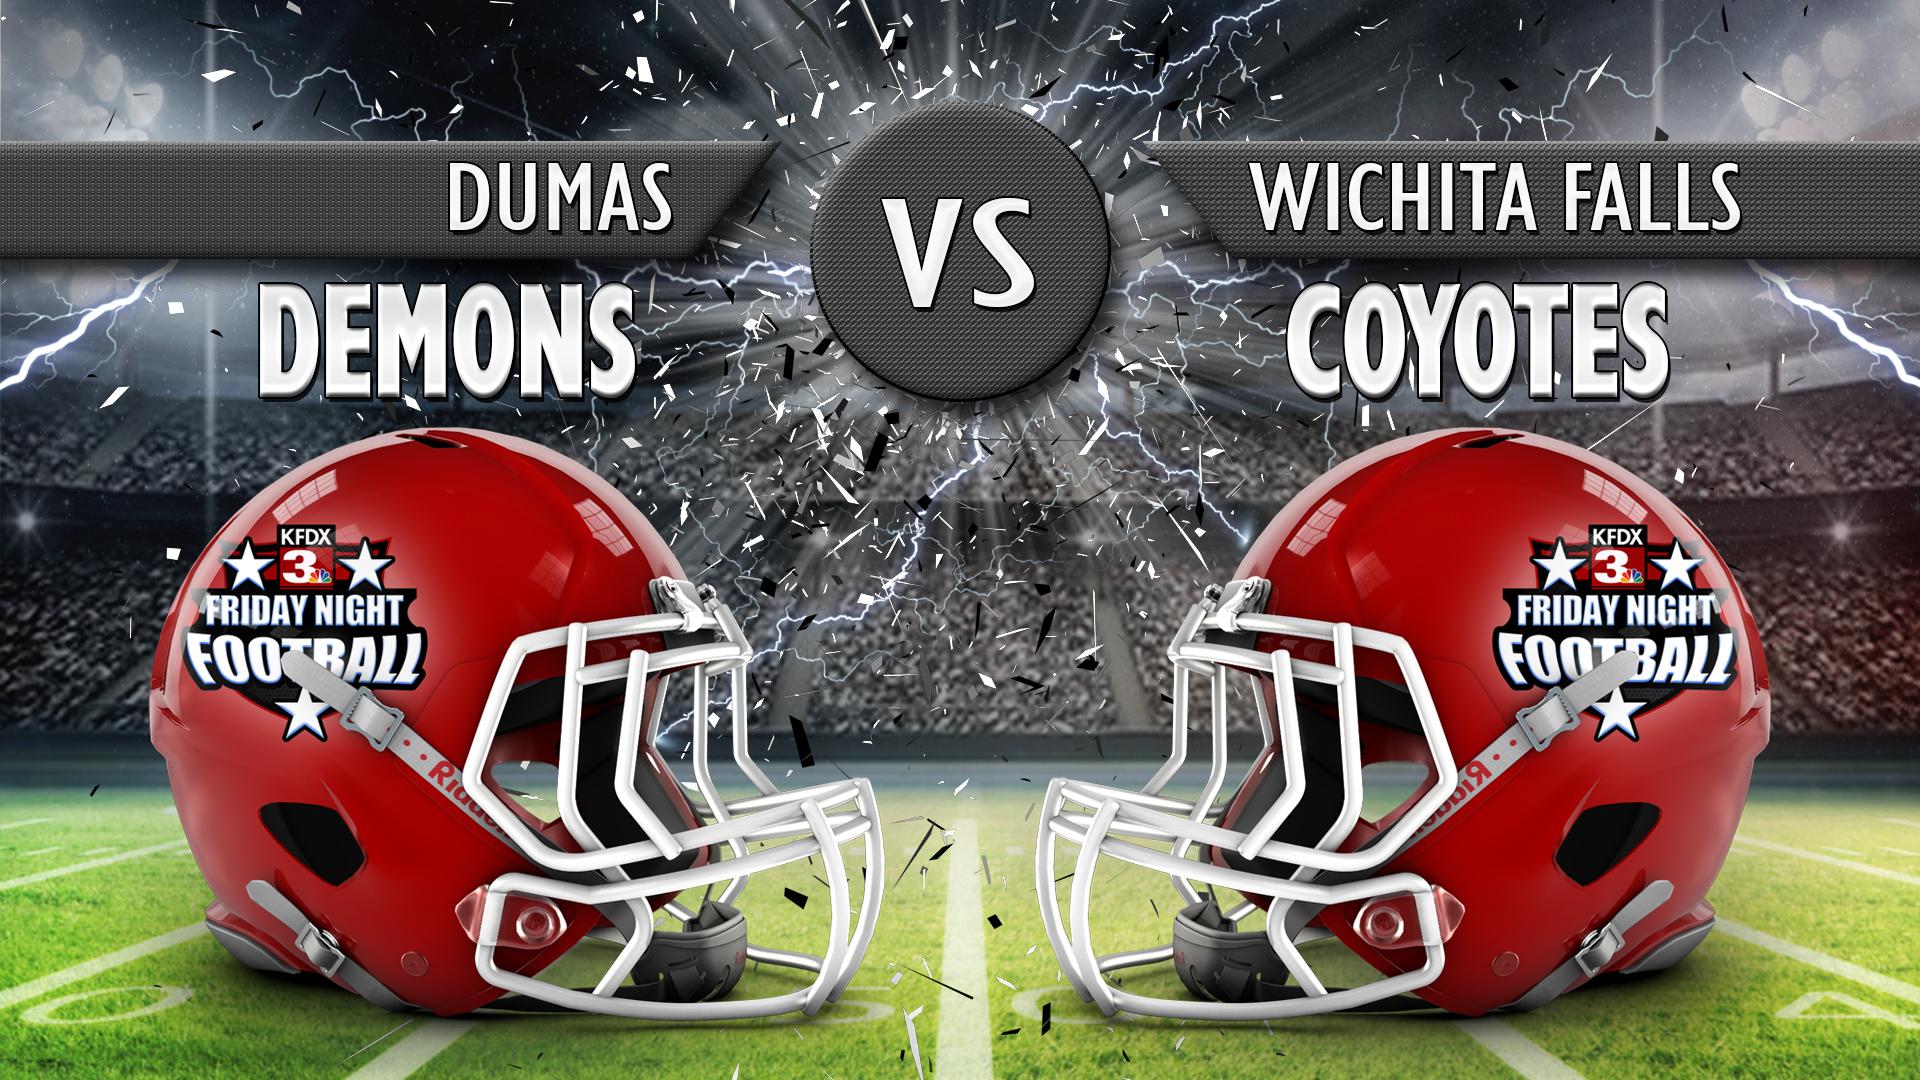 DUMAS VS WICHITA FALLS_1536990355929.jpg.jpg